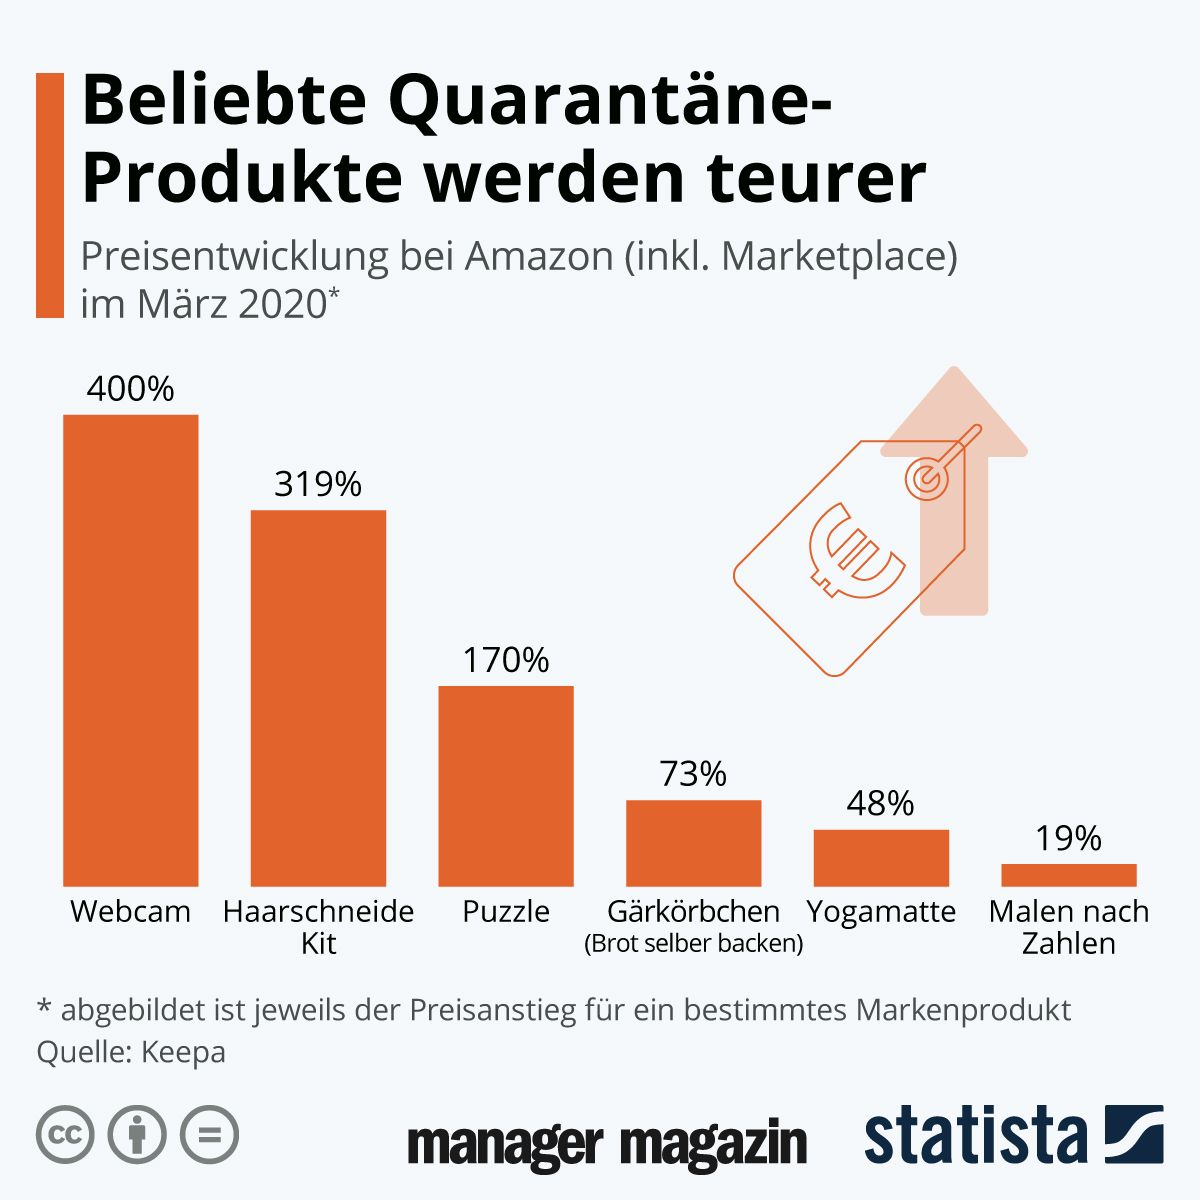 GRAFIK Beliebet Quarantäne-Produkte